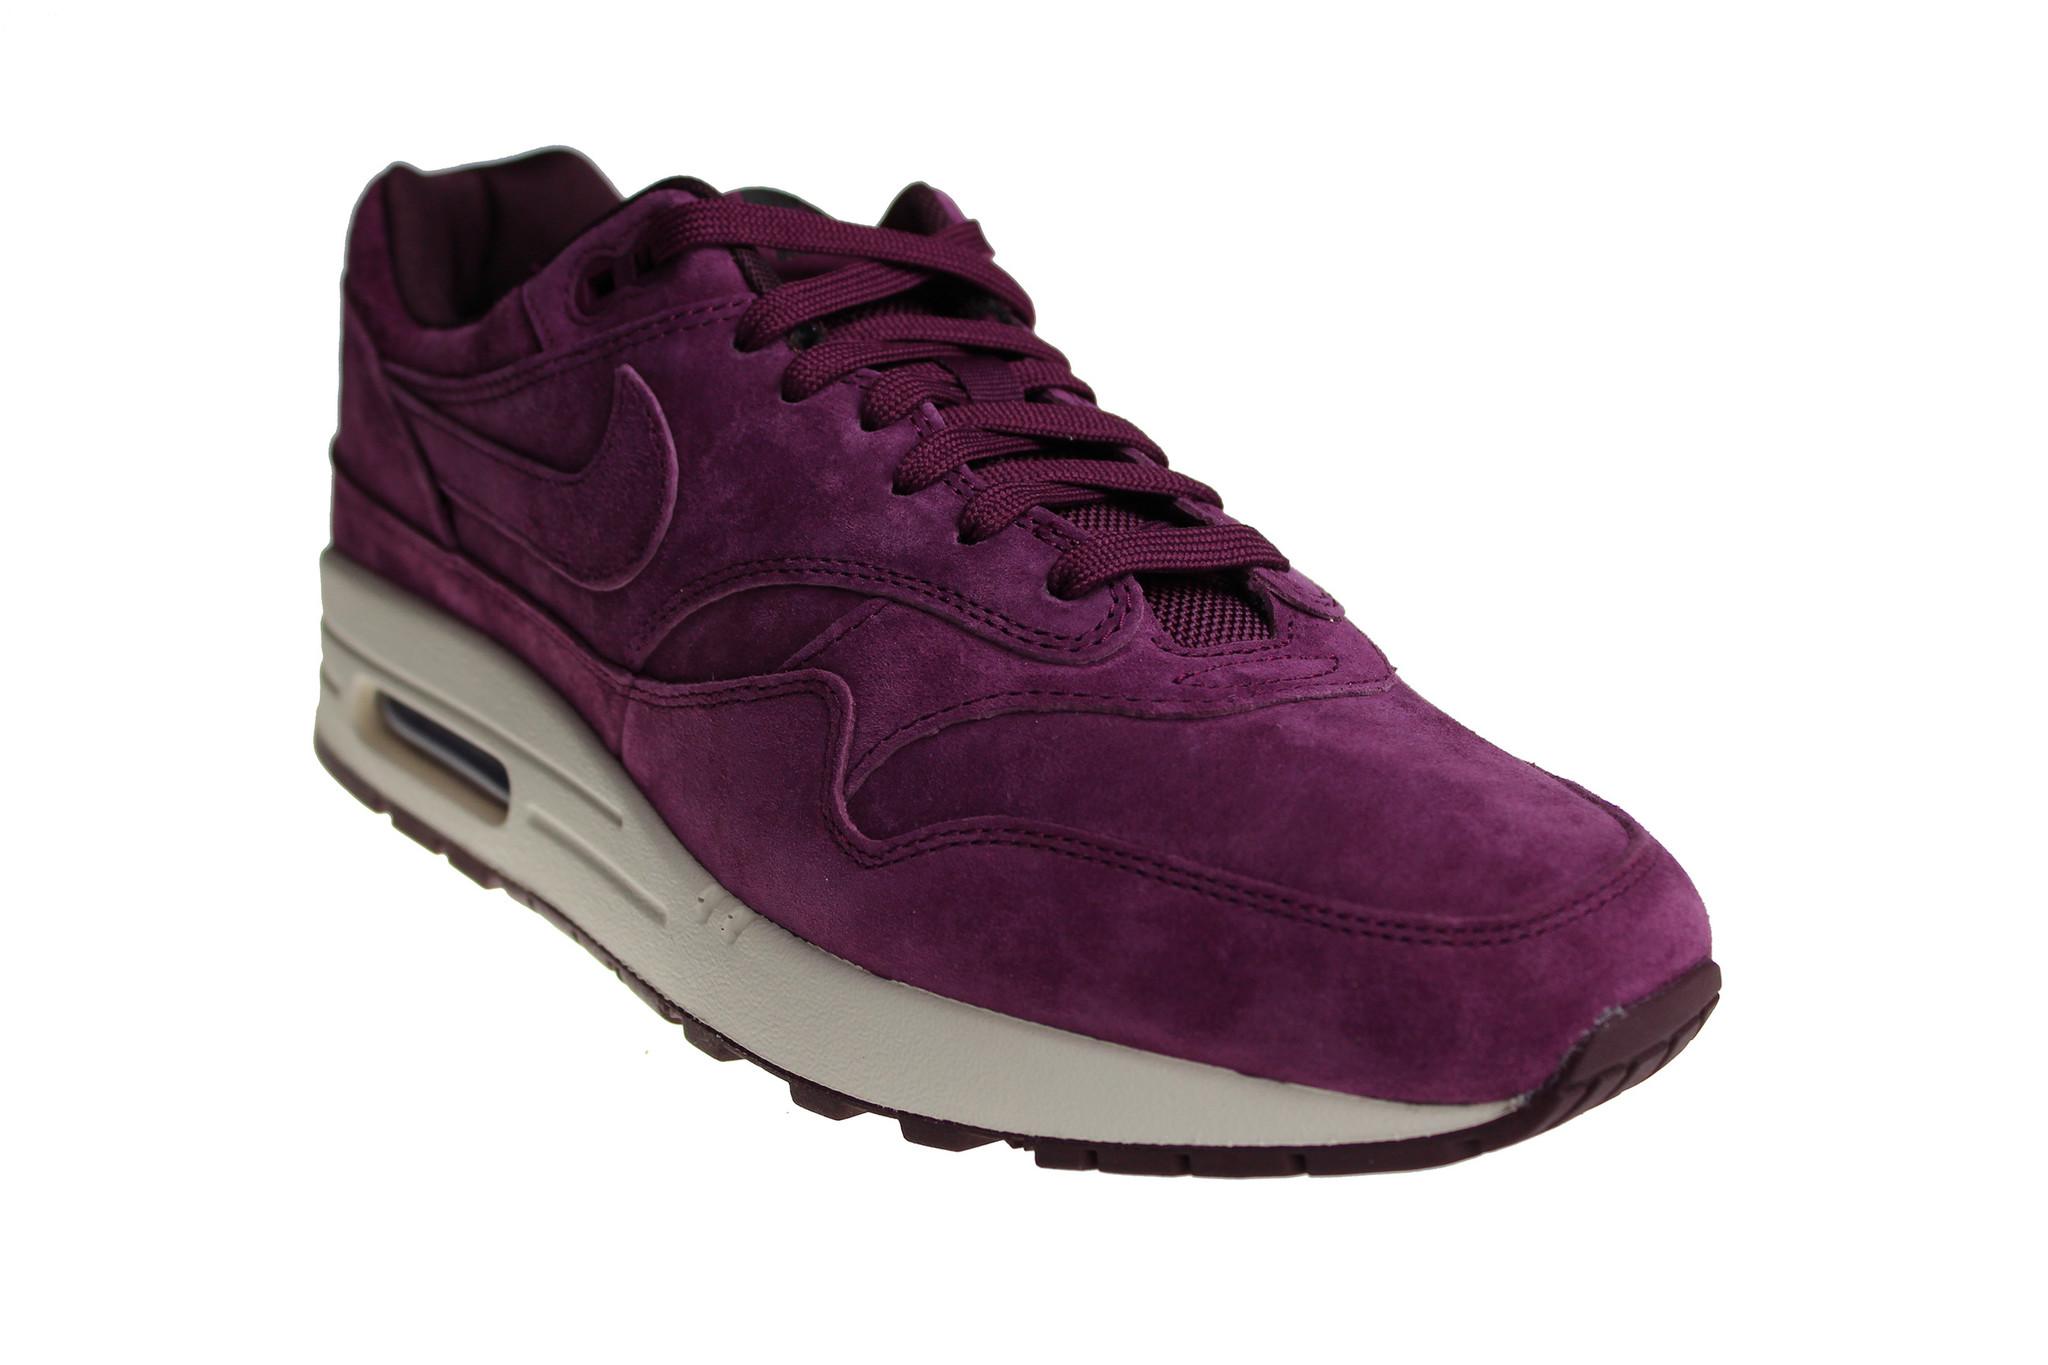 the latest 7f397 7403d Nike Air Max 1 Premium (Bordeaux Off-White) 875844 602 Men s Sneakers